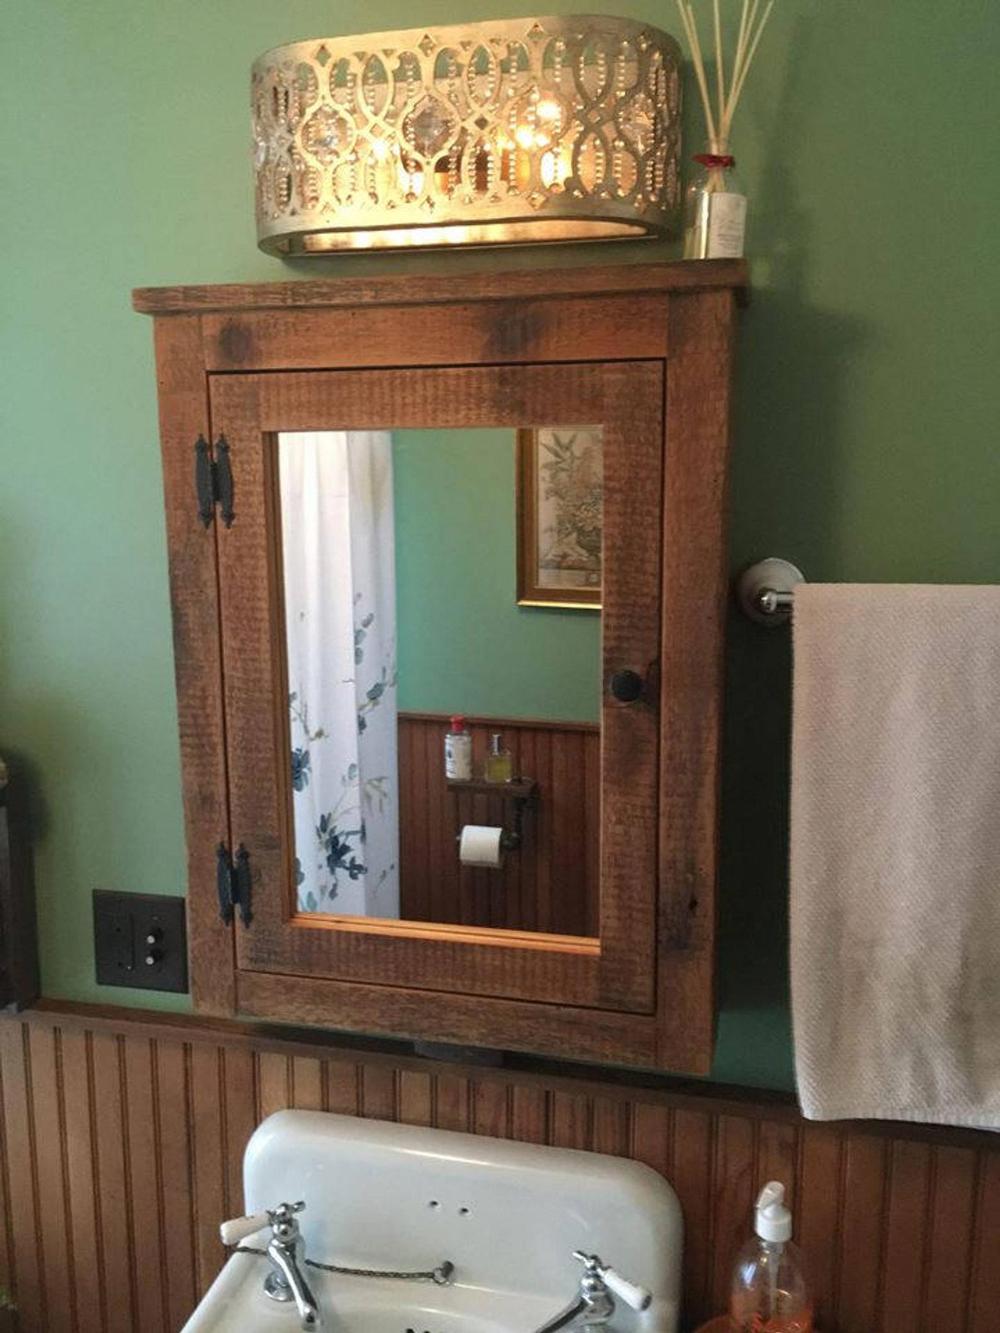 Bathroommirror In 2020 Medizinschrank Spiegel Rustikales Badezimmer Dekor Scheunenholz